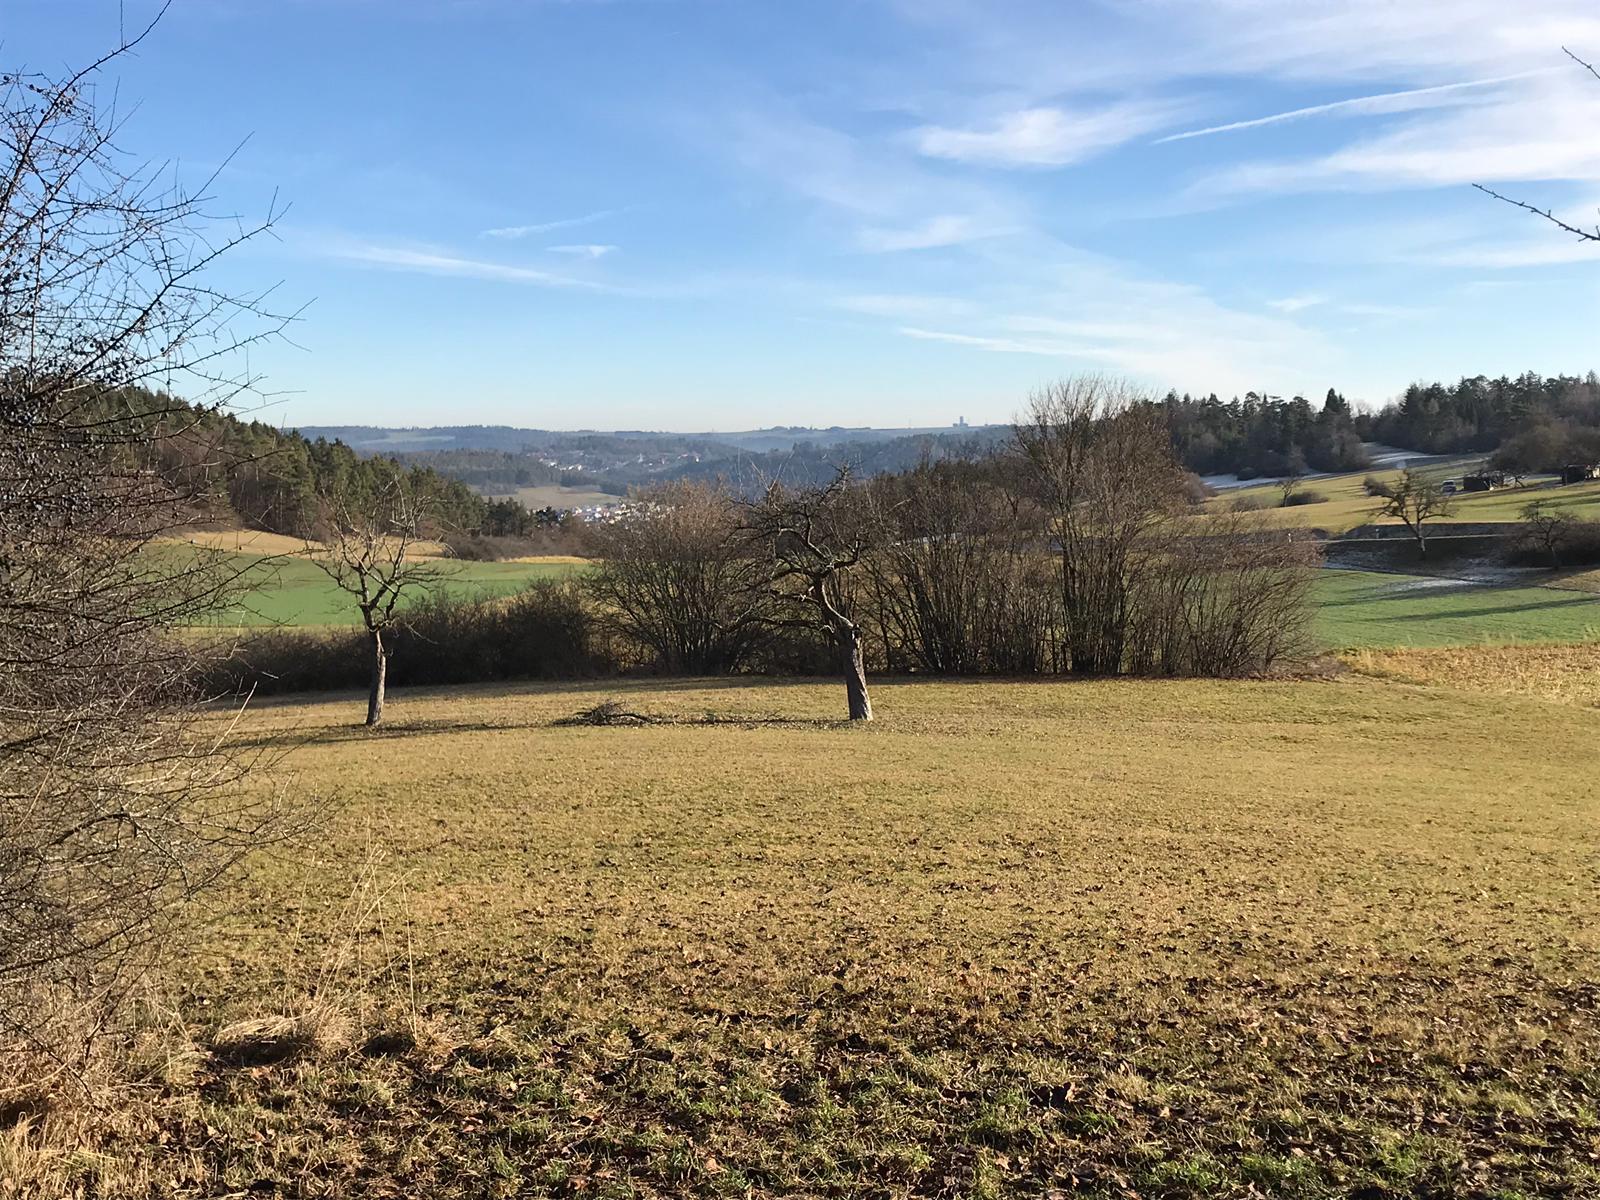 2018-12-28_Wanderung (17)